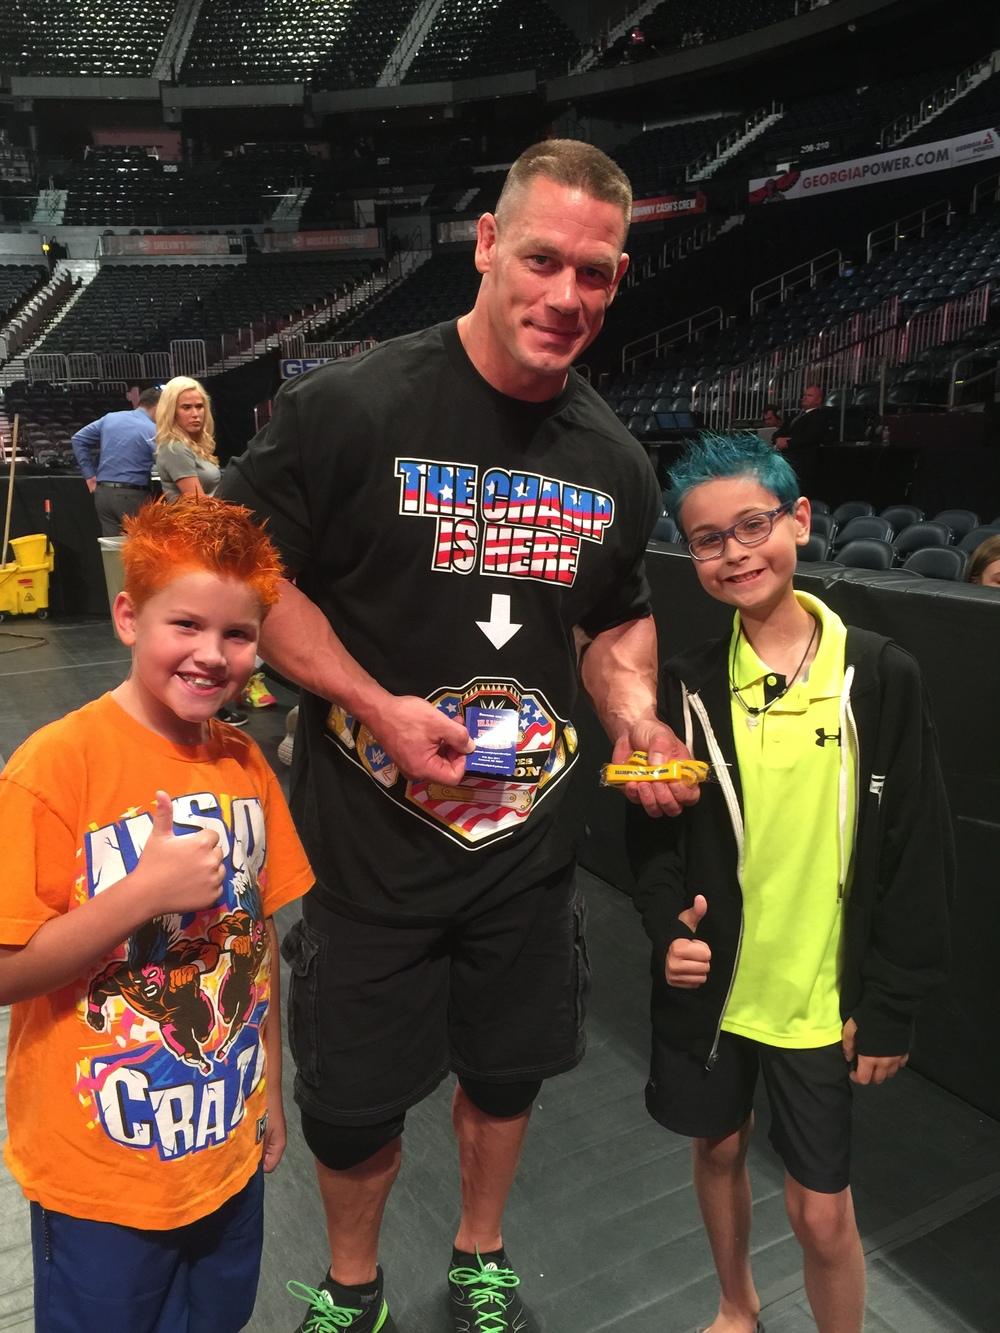 2015 John Cena.jpeg